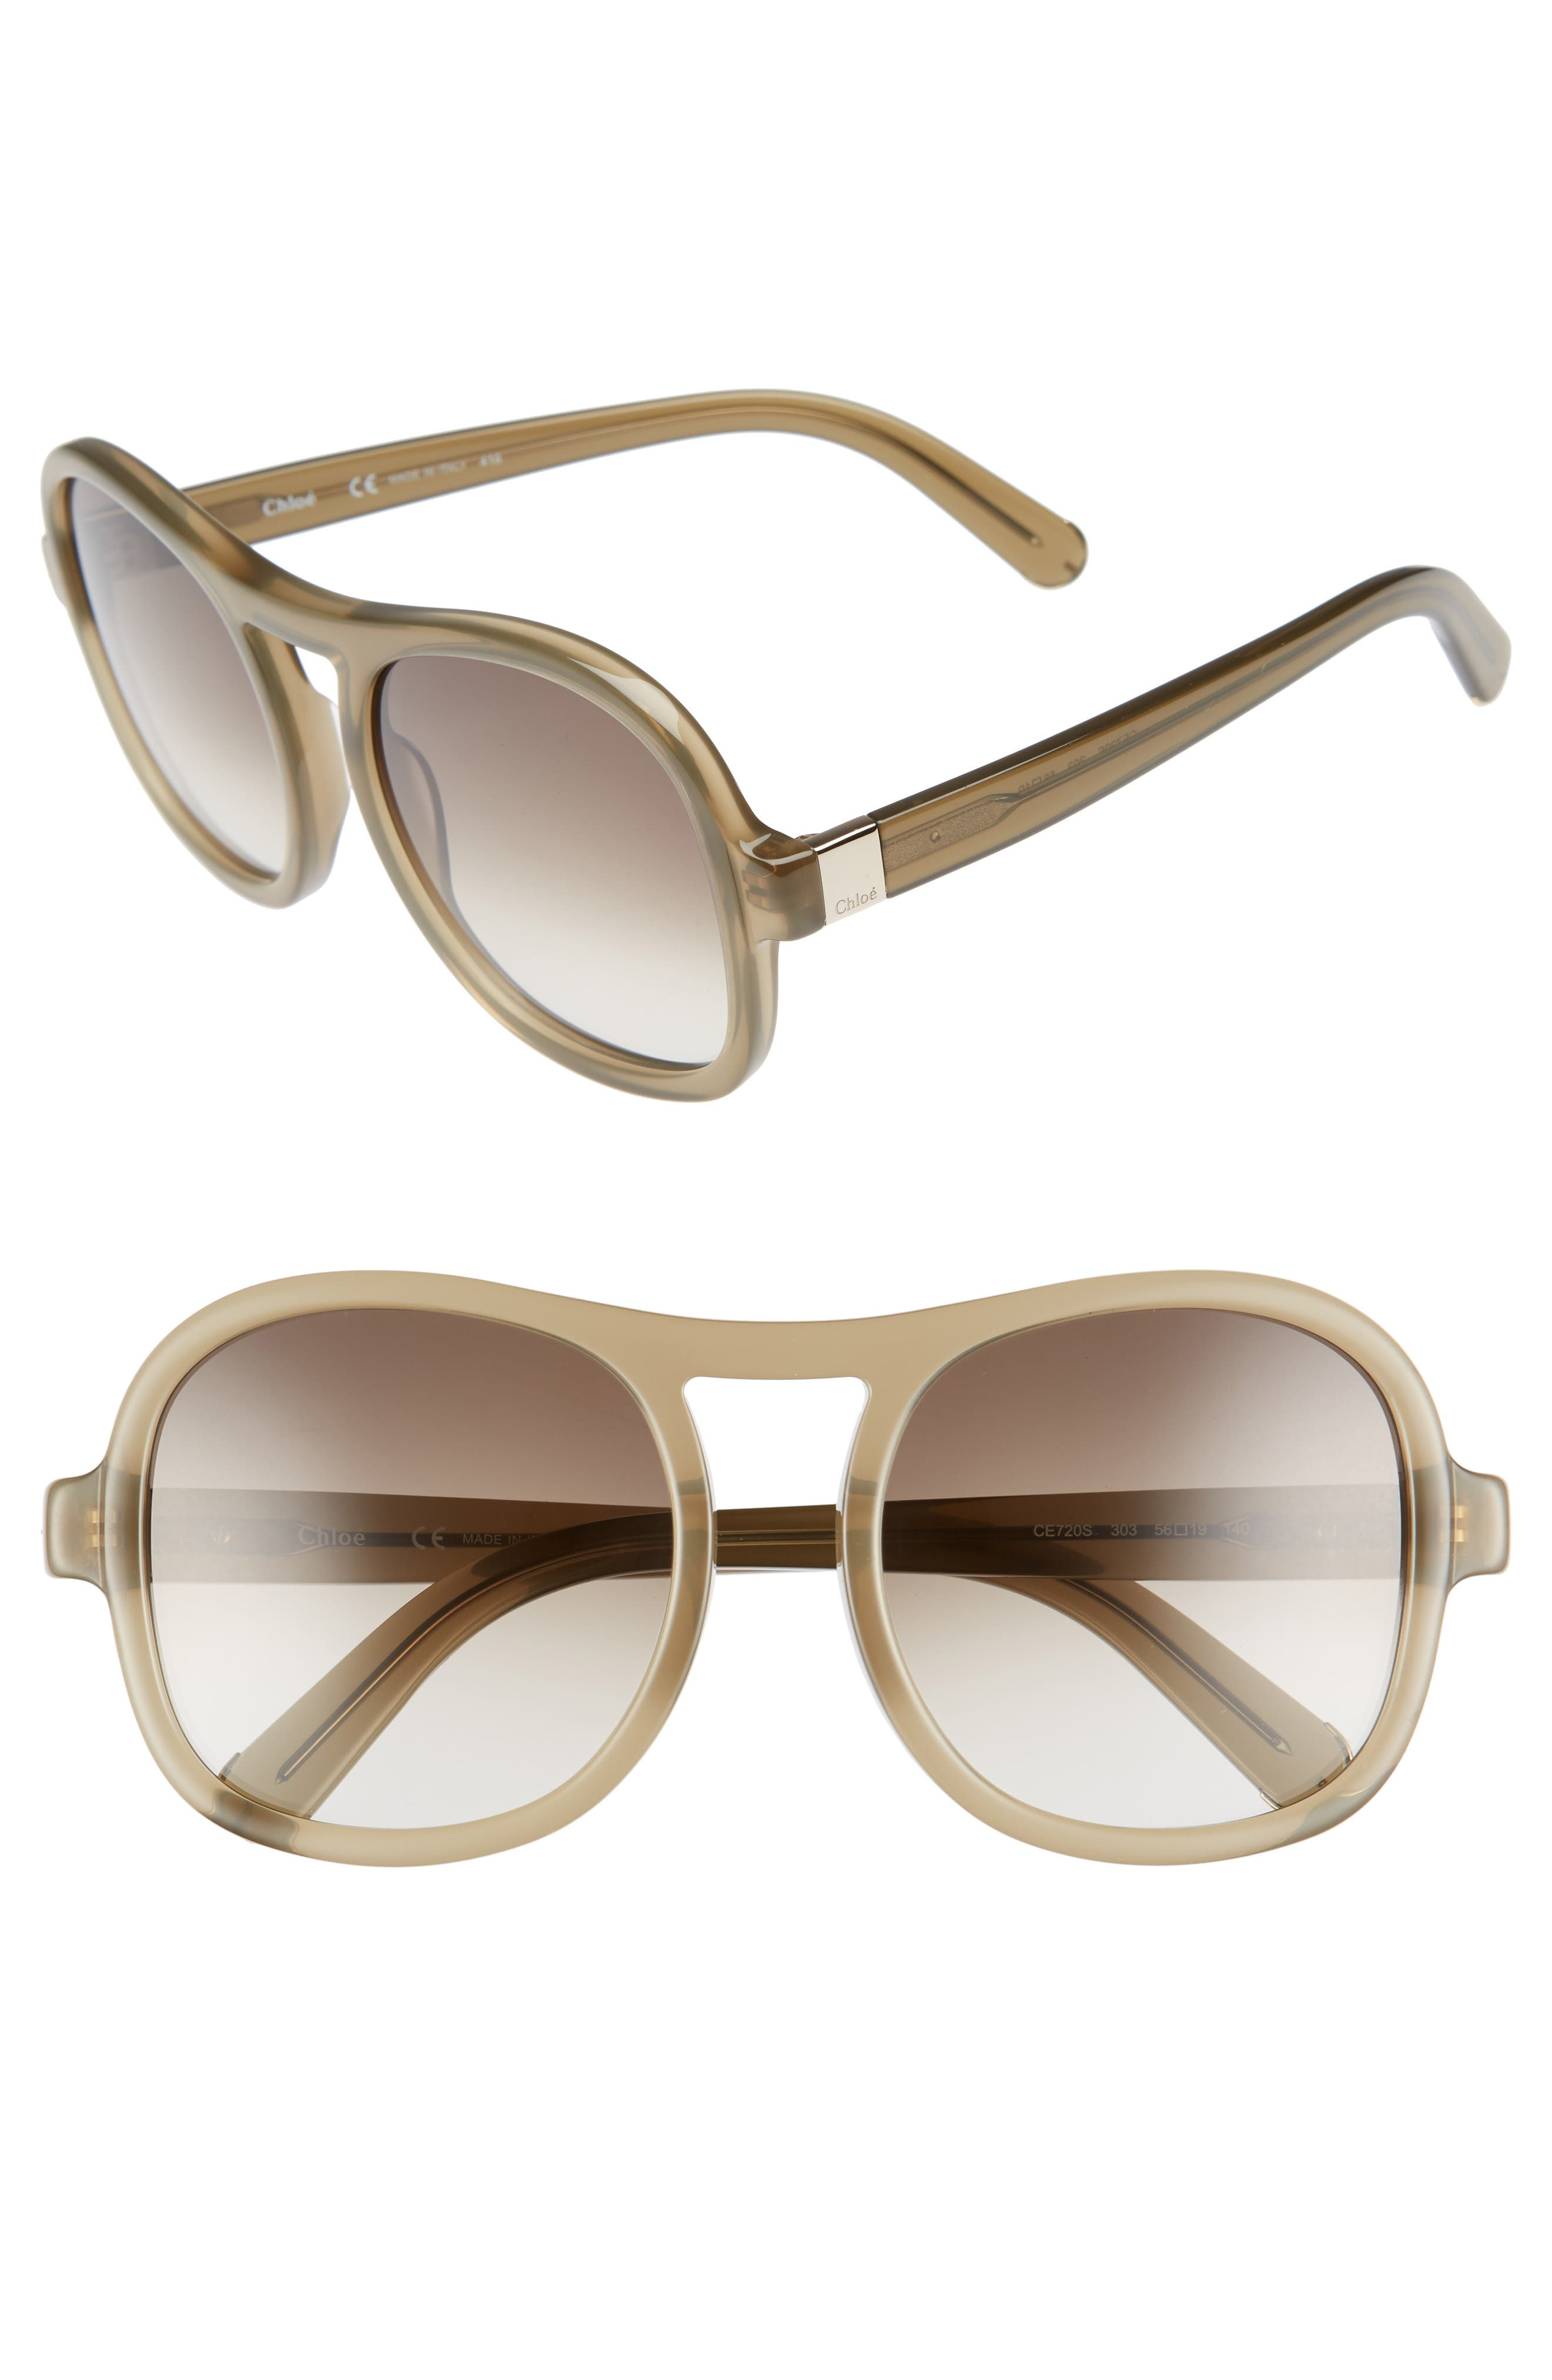 Main Image - Chloé Marlow 56mm Gradient Lens Sunglasses